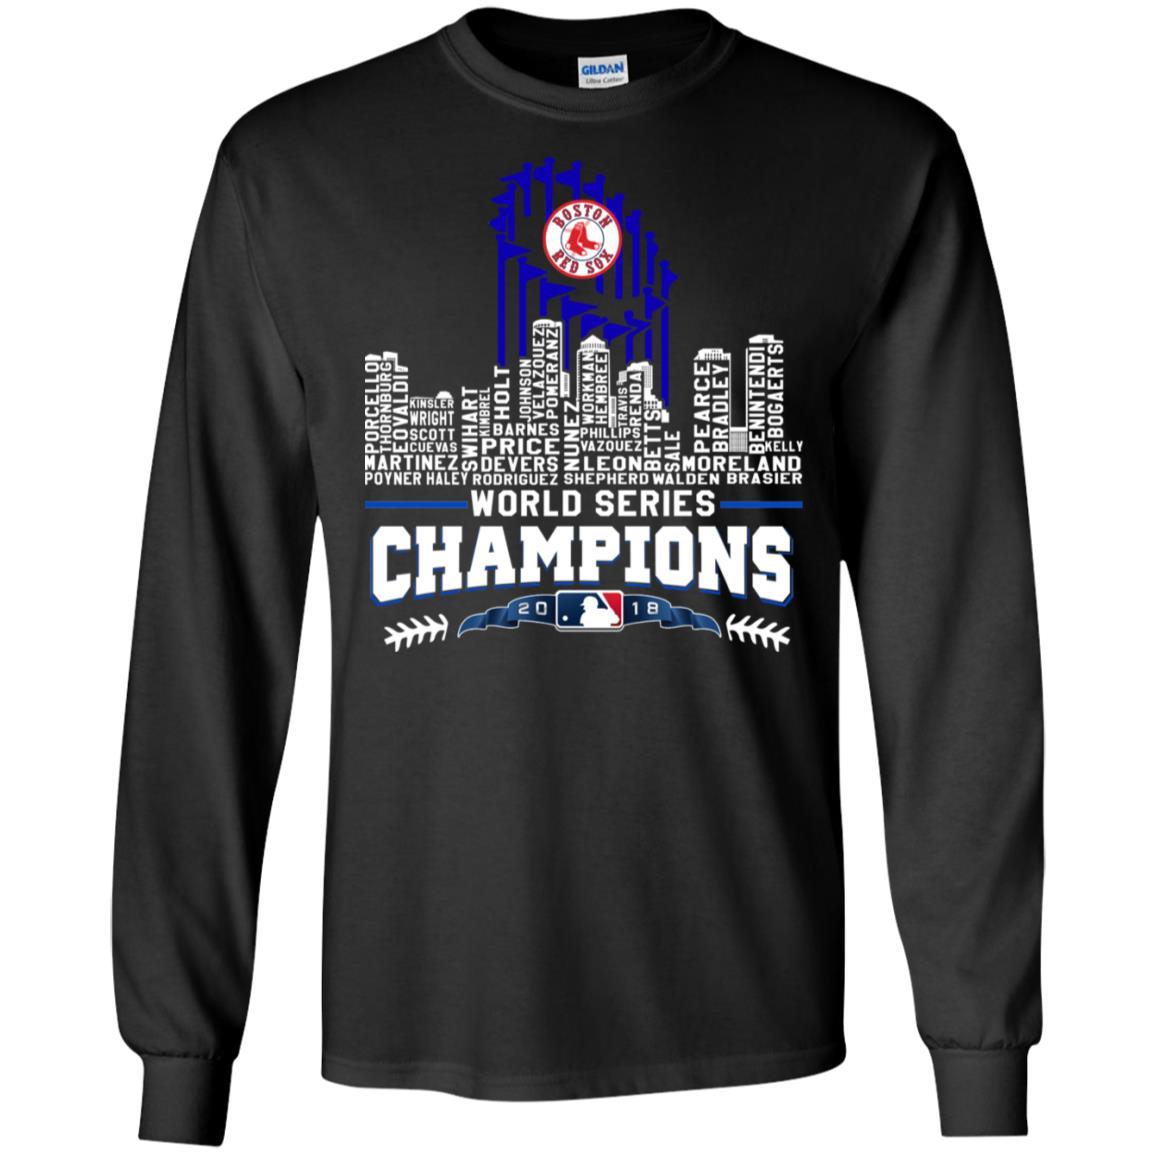 97d5f129e Boston Red Sox world series champions shirt - image 6108 510x510